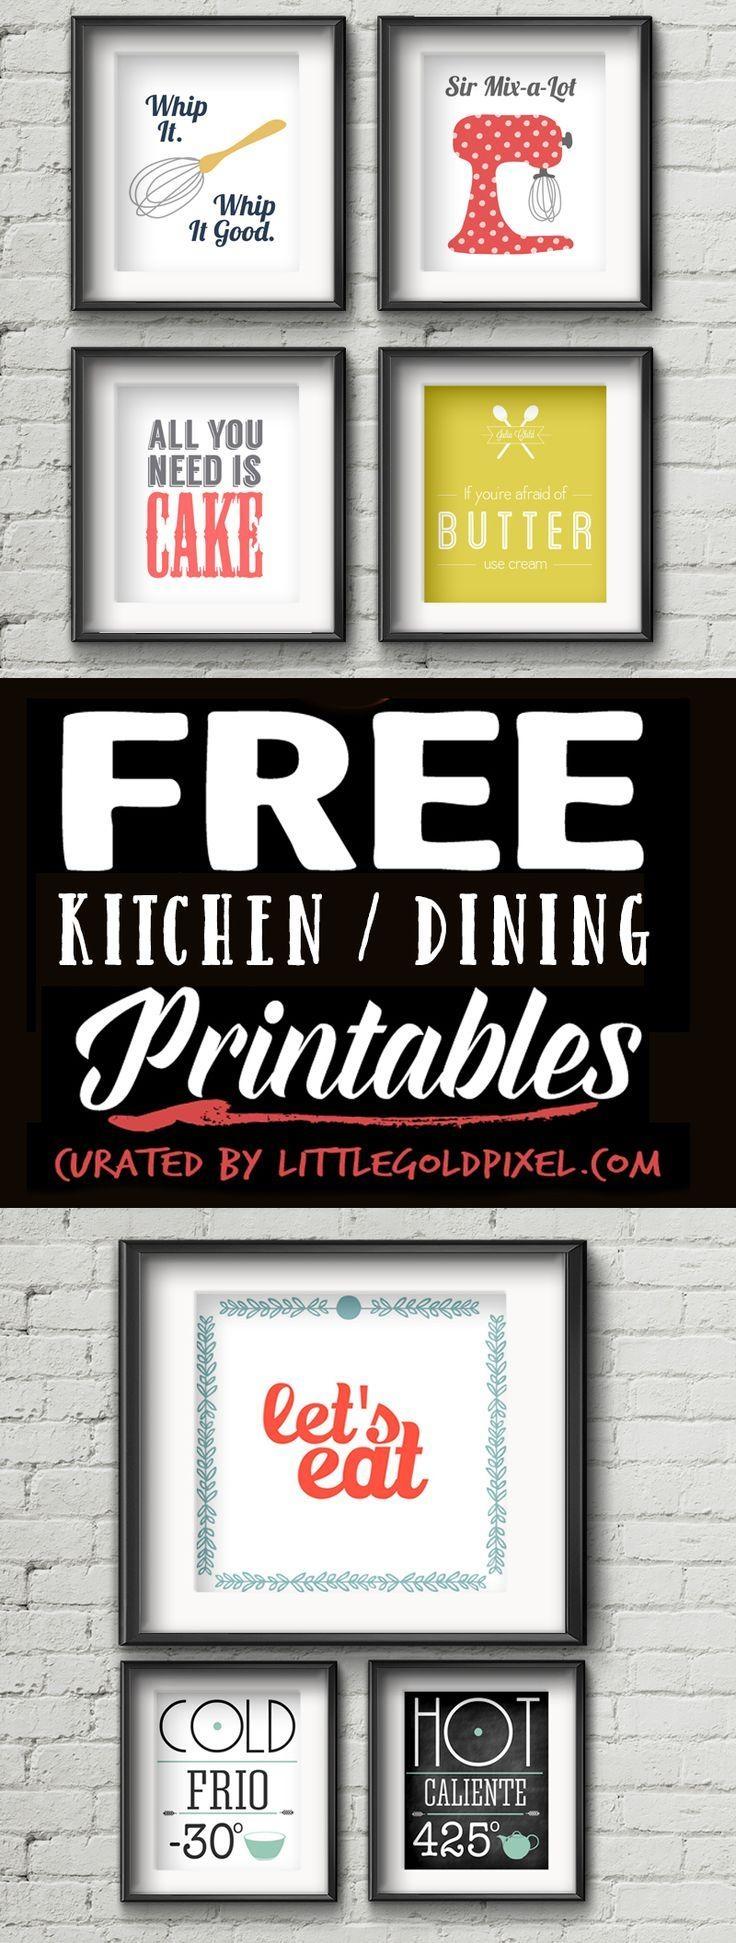 Best 20+ Kitchen Wall Art Ideas On Pinterest | Kitchen Art Within Kitchen And Dining Wall Art (Image 4 of 20)